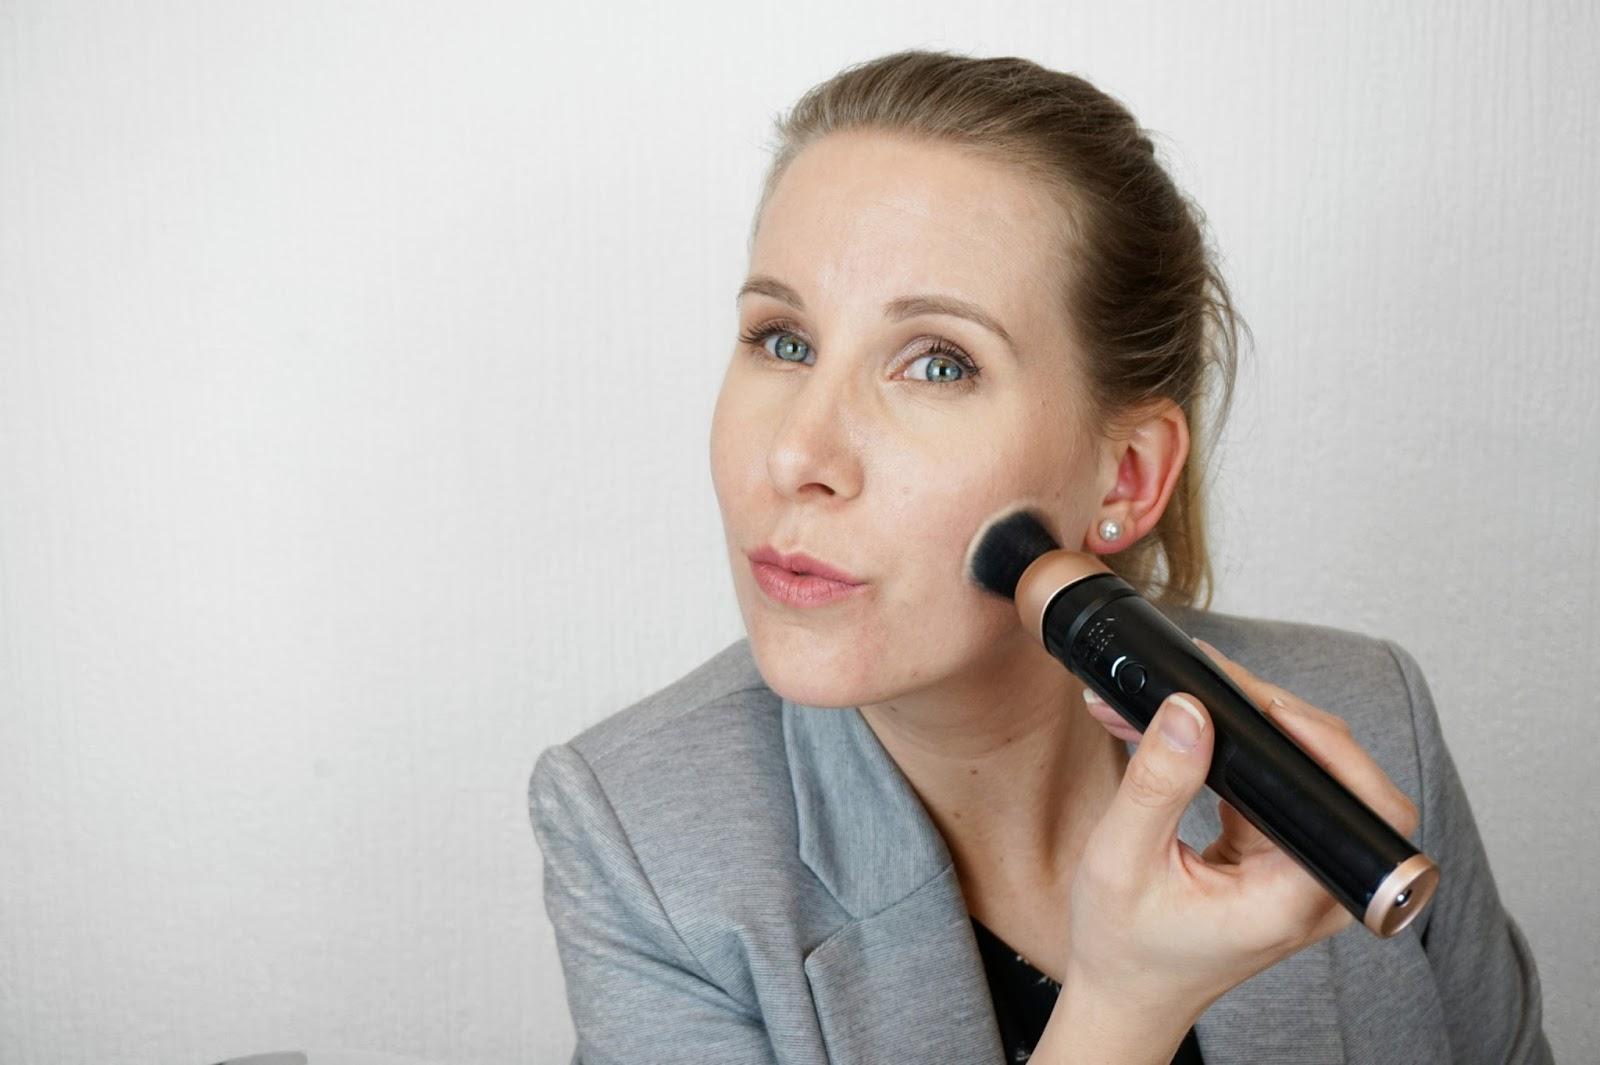 Using_The_Magnitone_London_BlendUp_Makeup_Blending_Brush